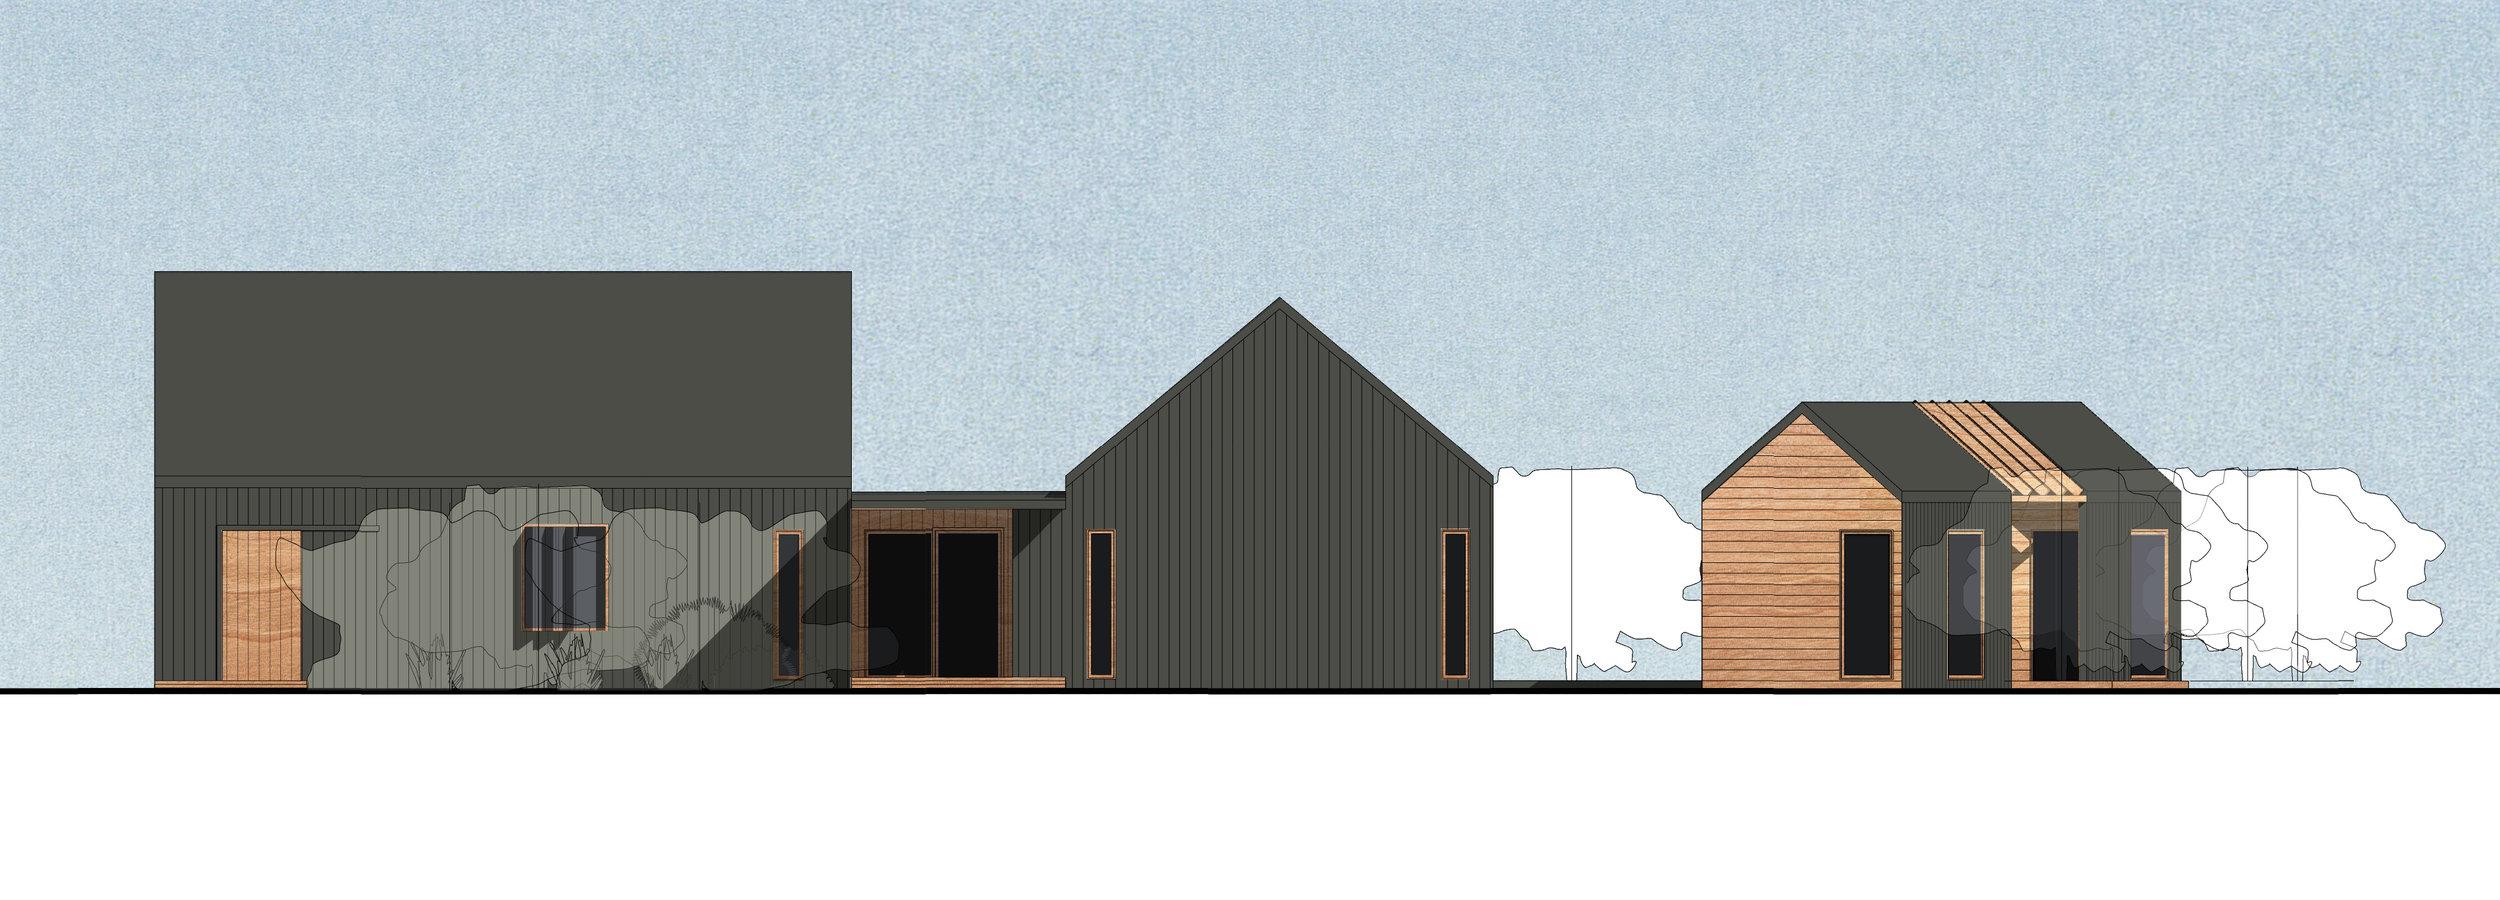 300817+Tovey+House_Waka+East+Elevation.jpg